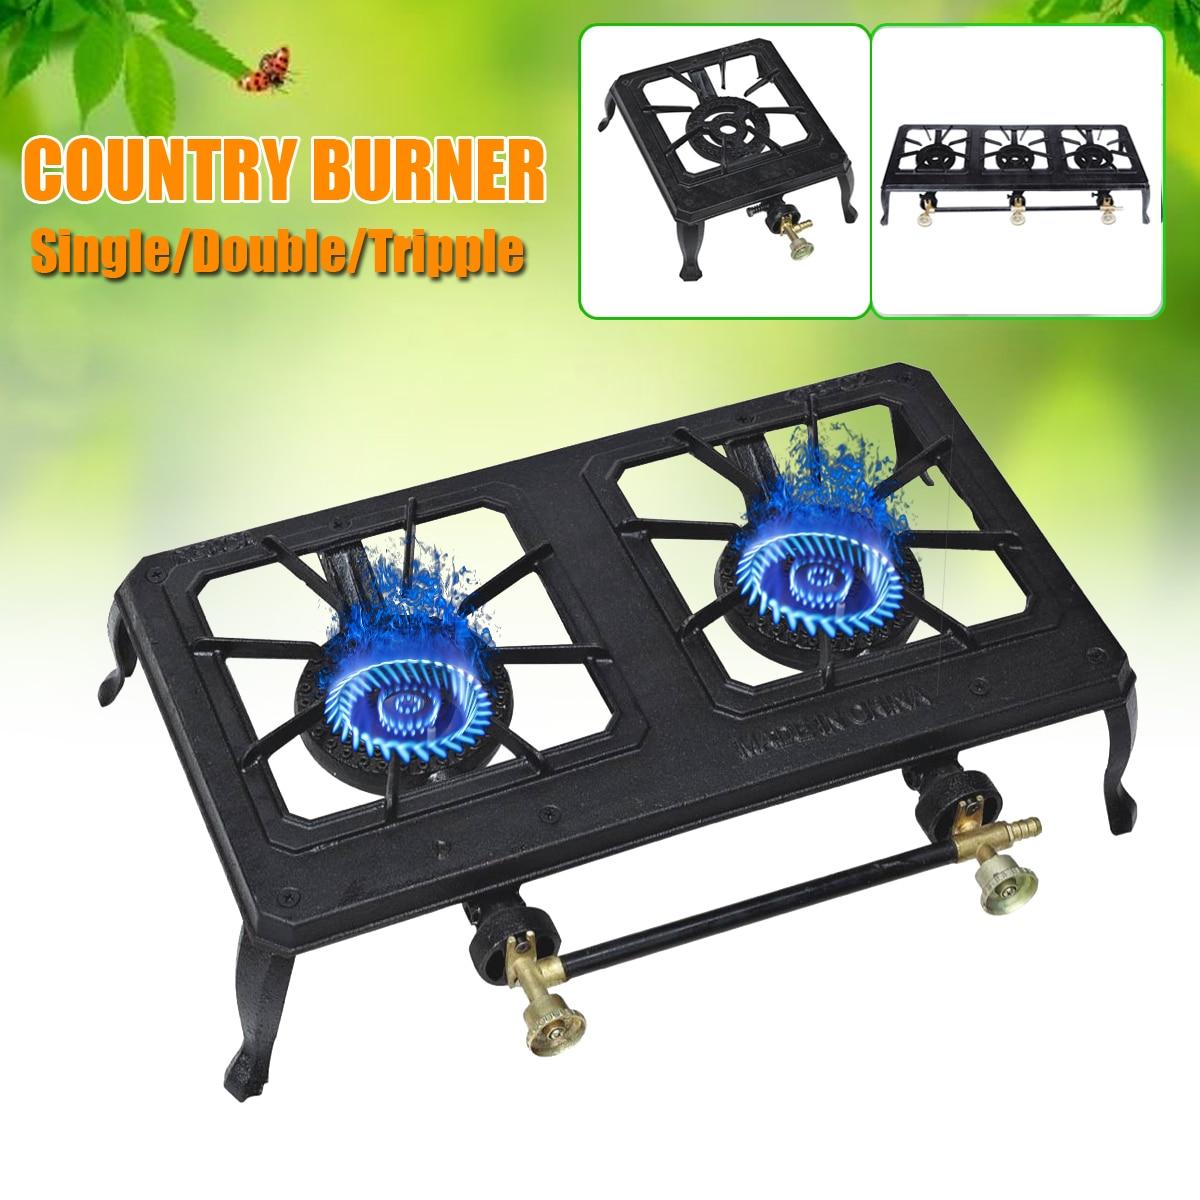 все цены на Single/Double/Tripple Burner Country Cooker Cast Iron Gas Energy Saving Burner Camping Tent Portable Outdoor Casting Iron Stove онлайн